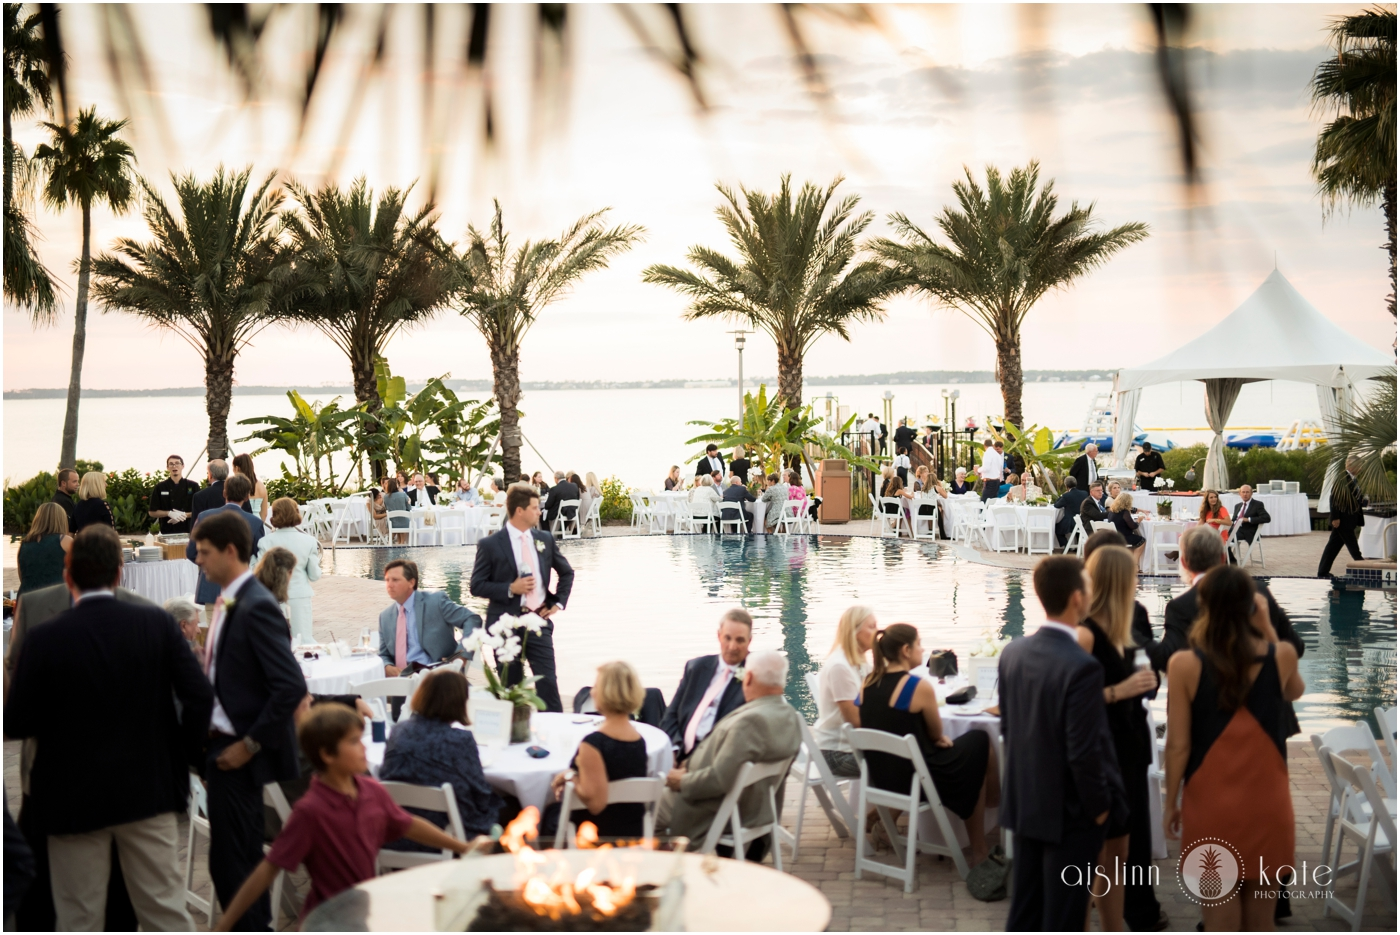 Portofino Island Resort  | Lower Pool Deck |  Caroline + Joiner